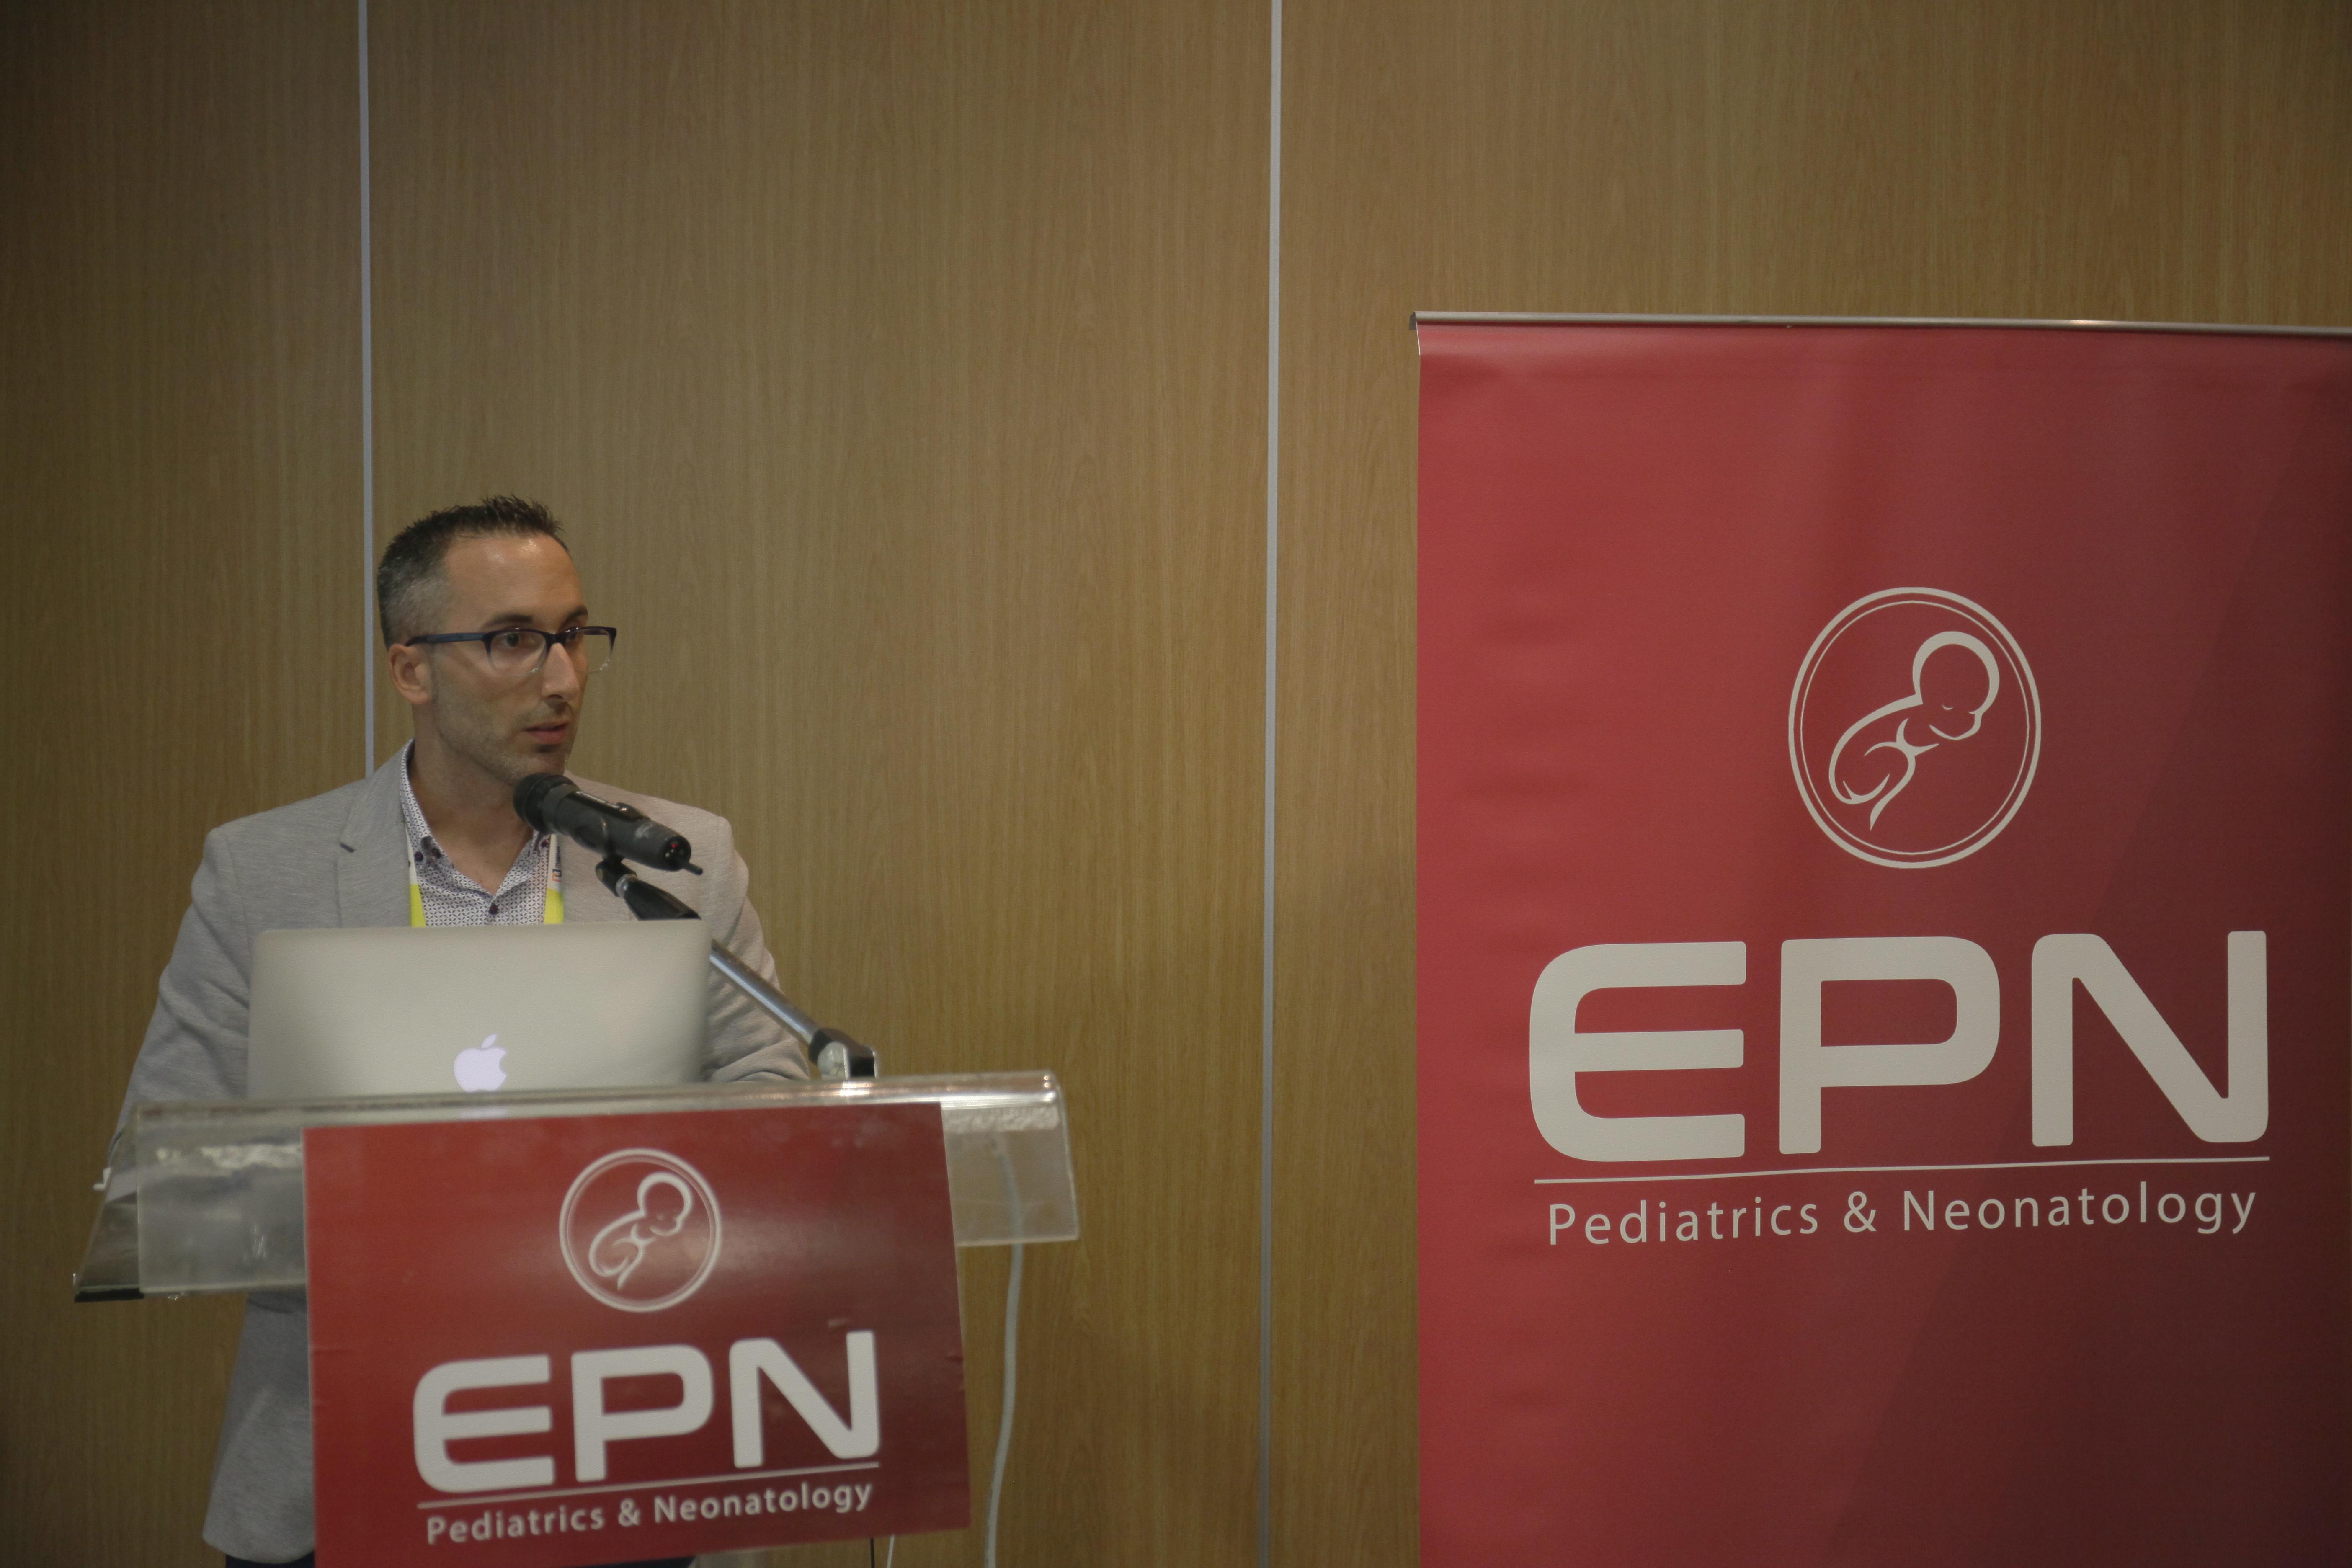 Neonatal Conferences